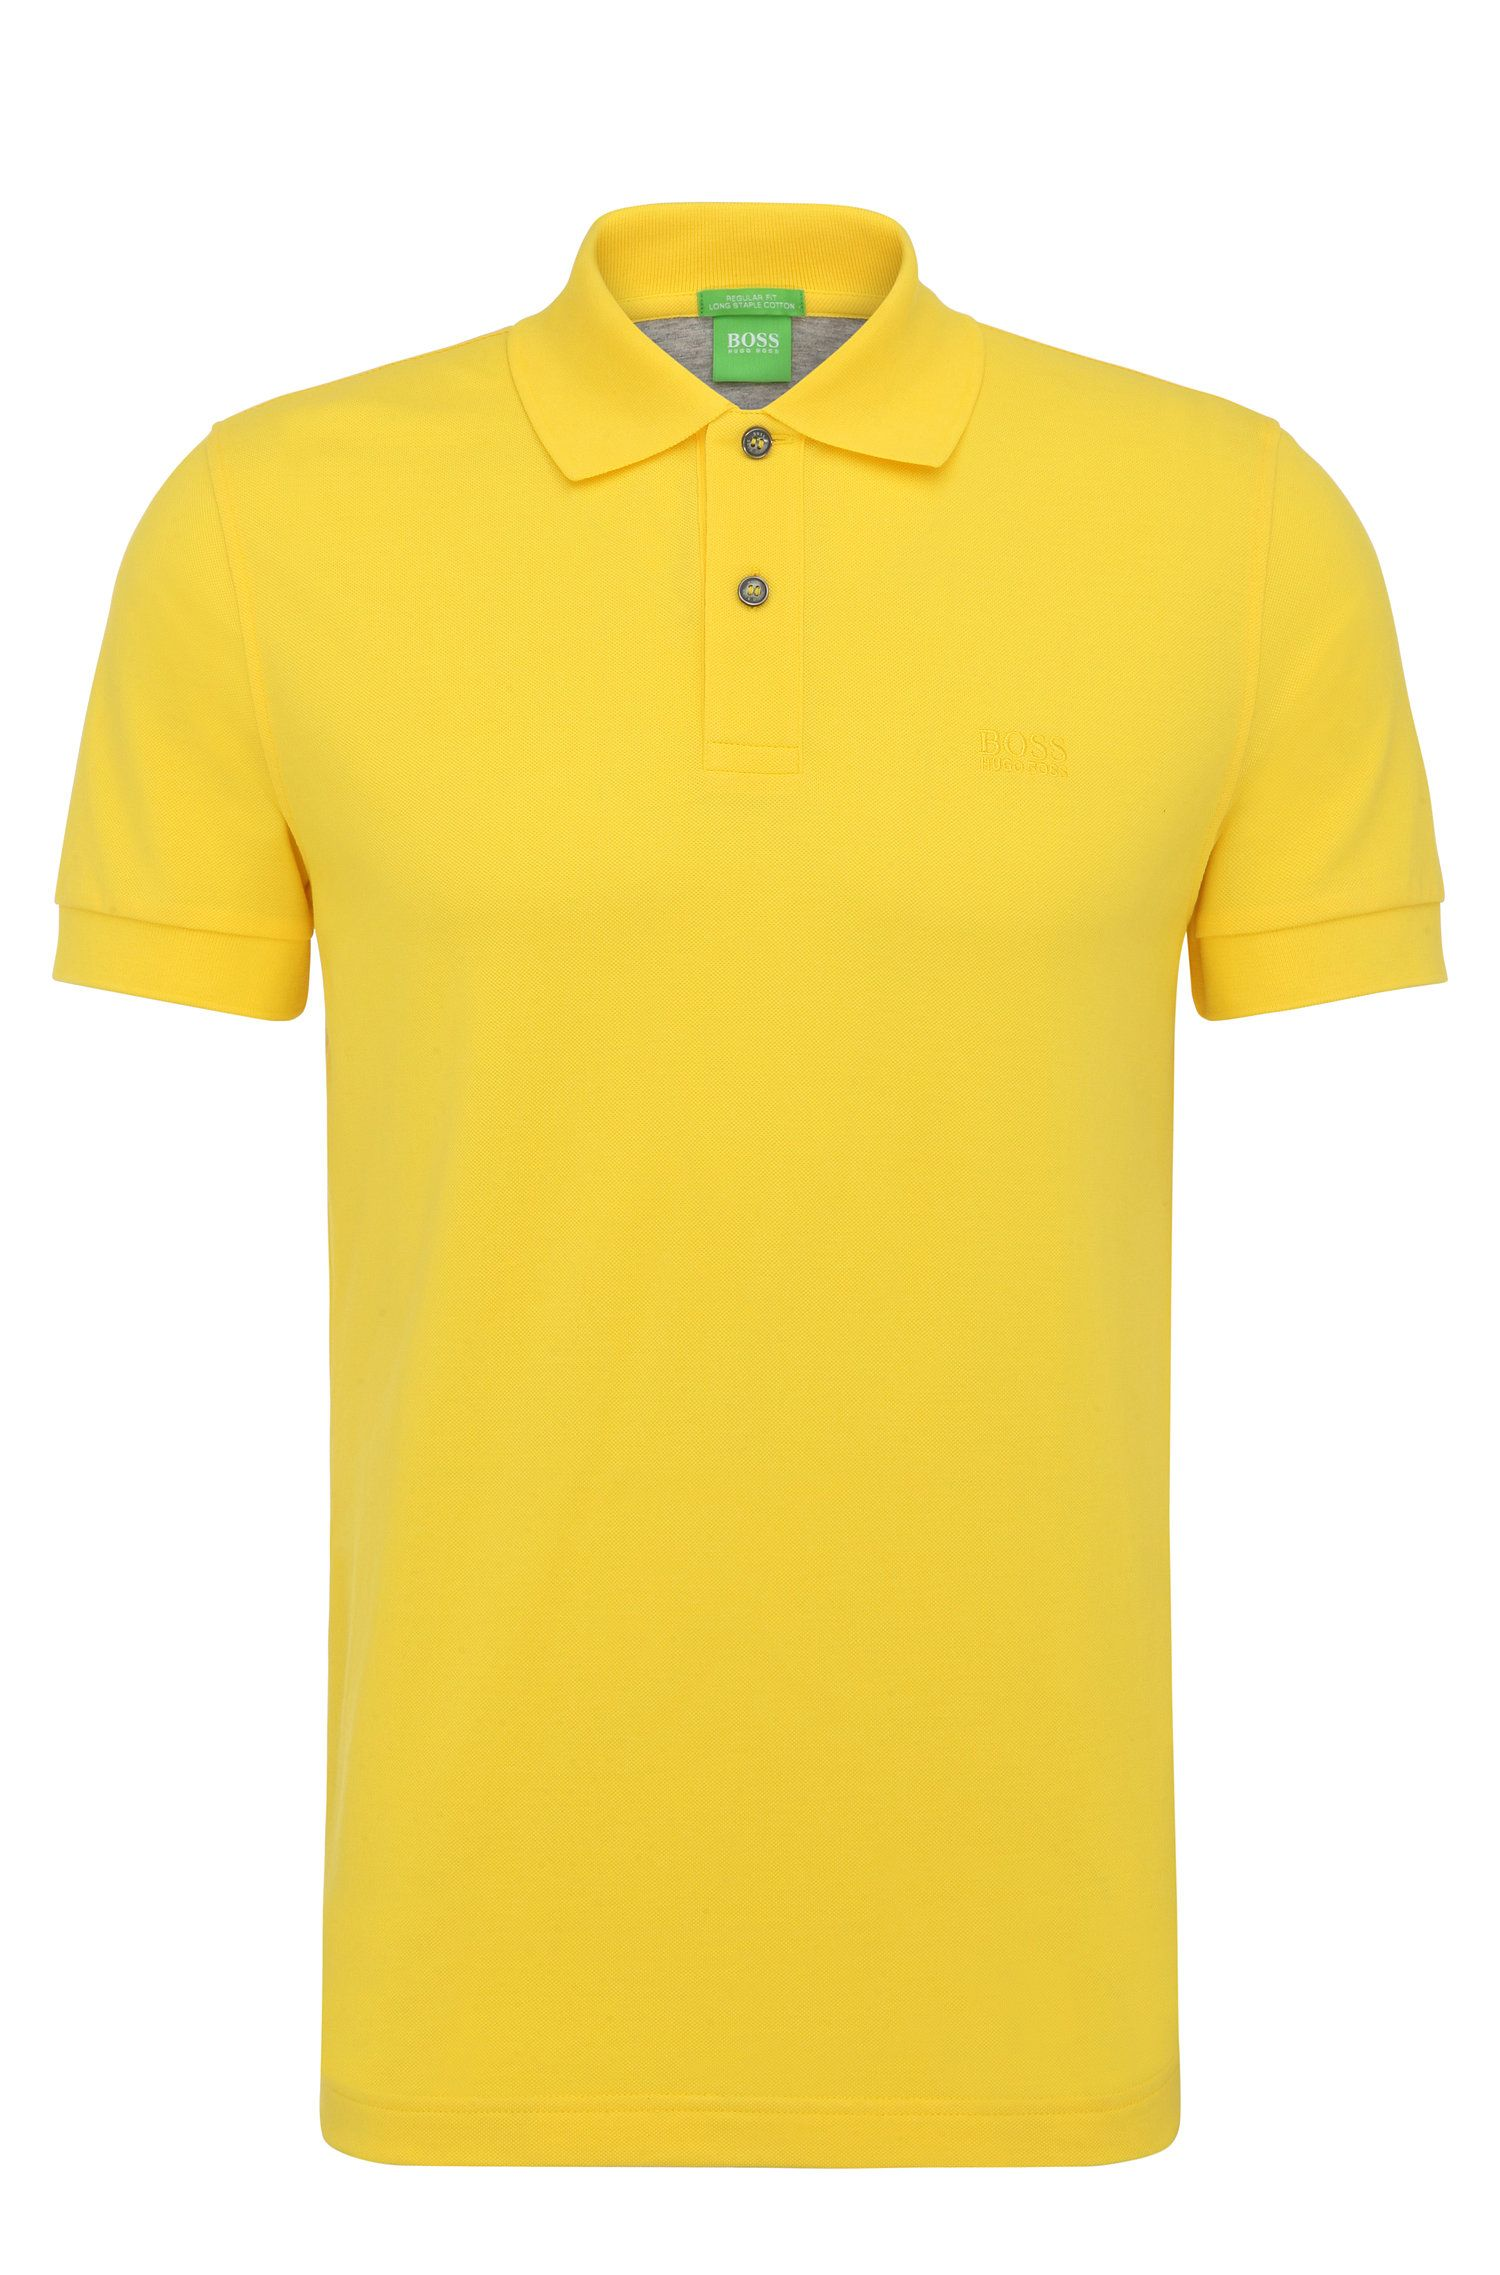 Regular-Fit Poloshirt aus Piqué mit Ton-in-Ton-Details